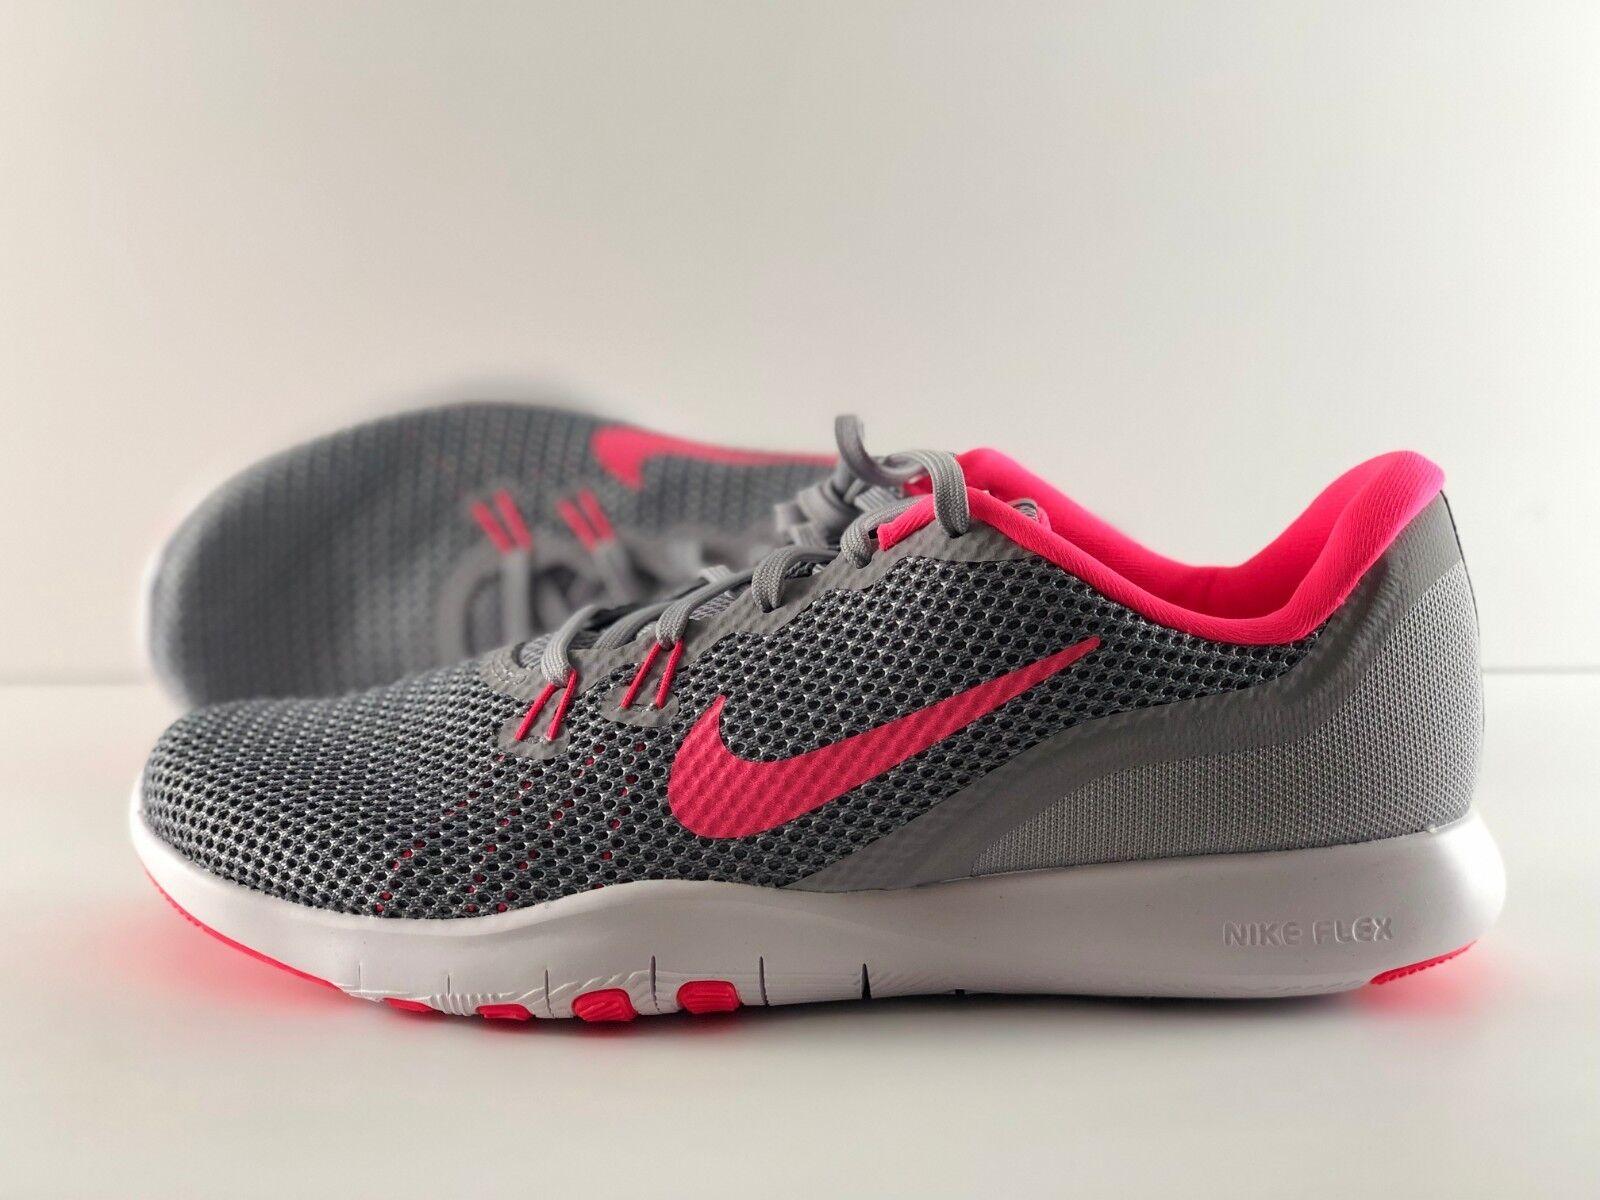 Nike Wmns Flex Trainer 7 Wolf grau   Racer Rosa 898479 006 Größe 10